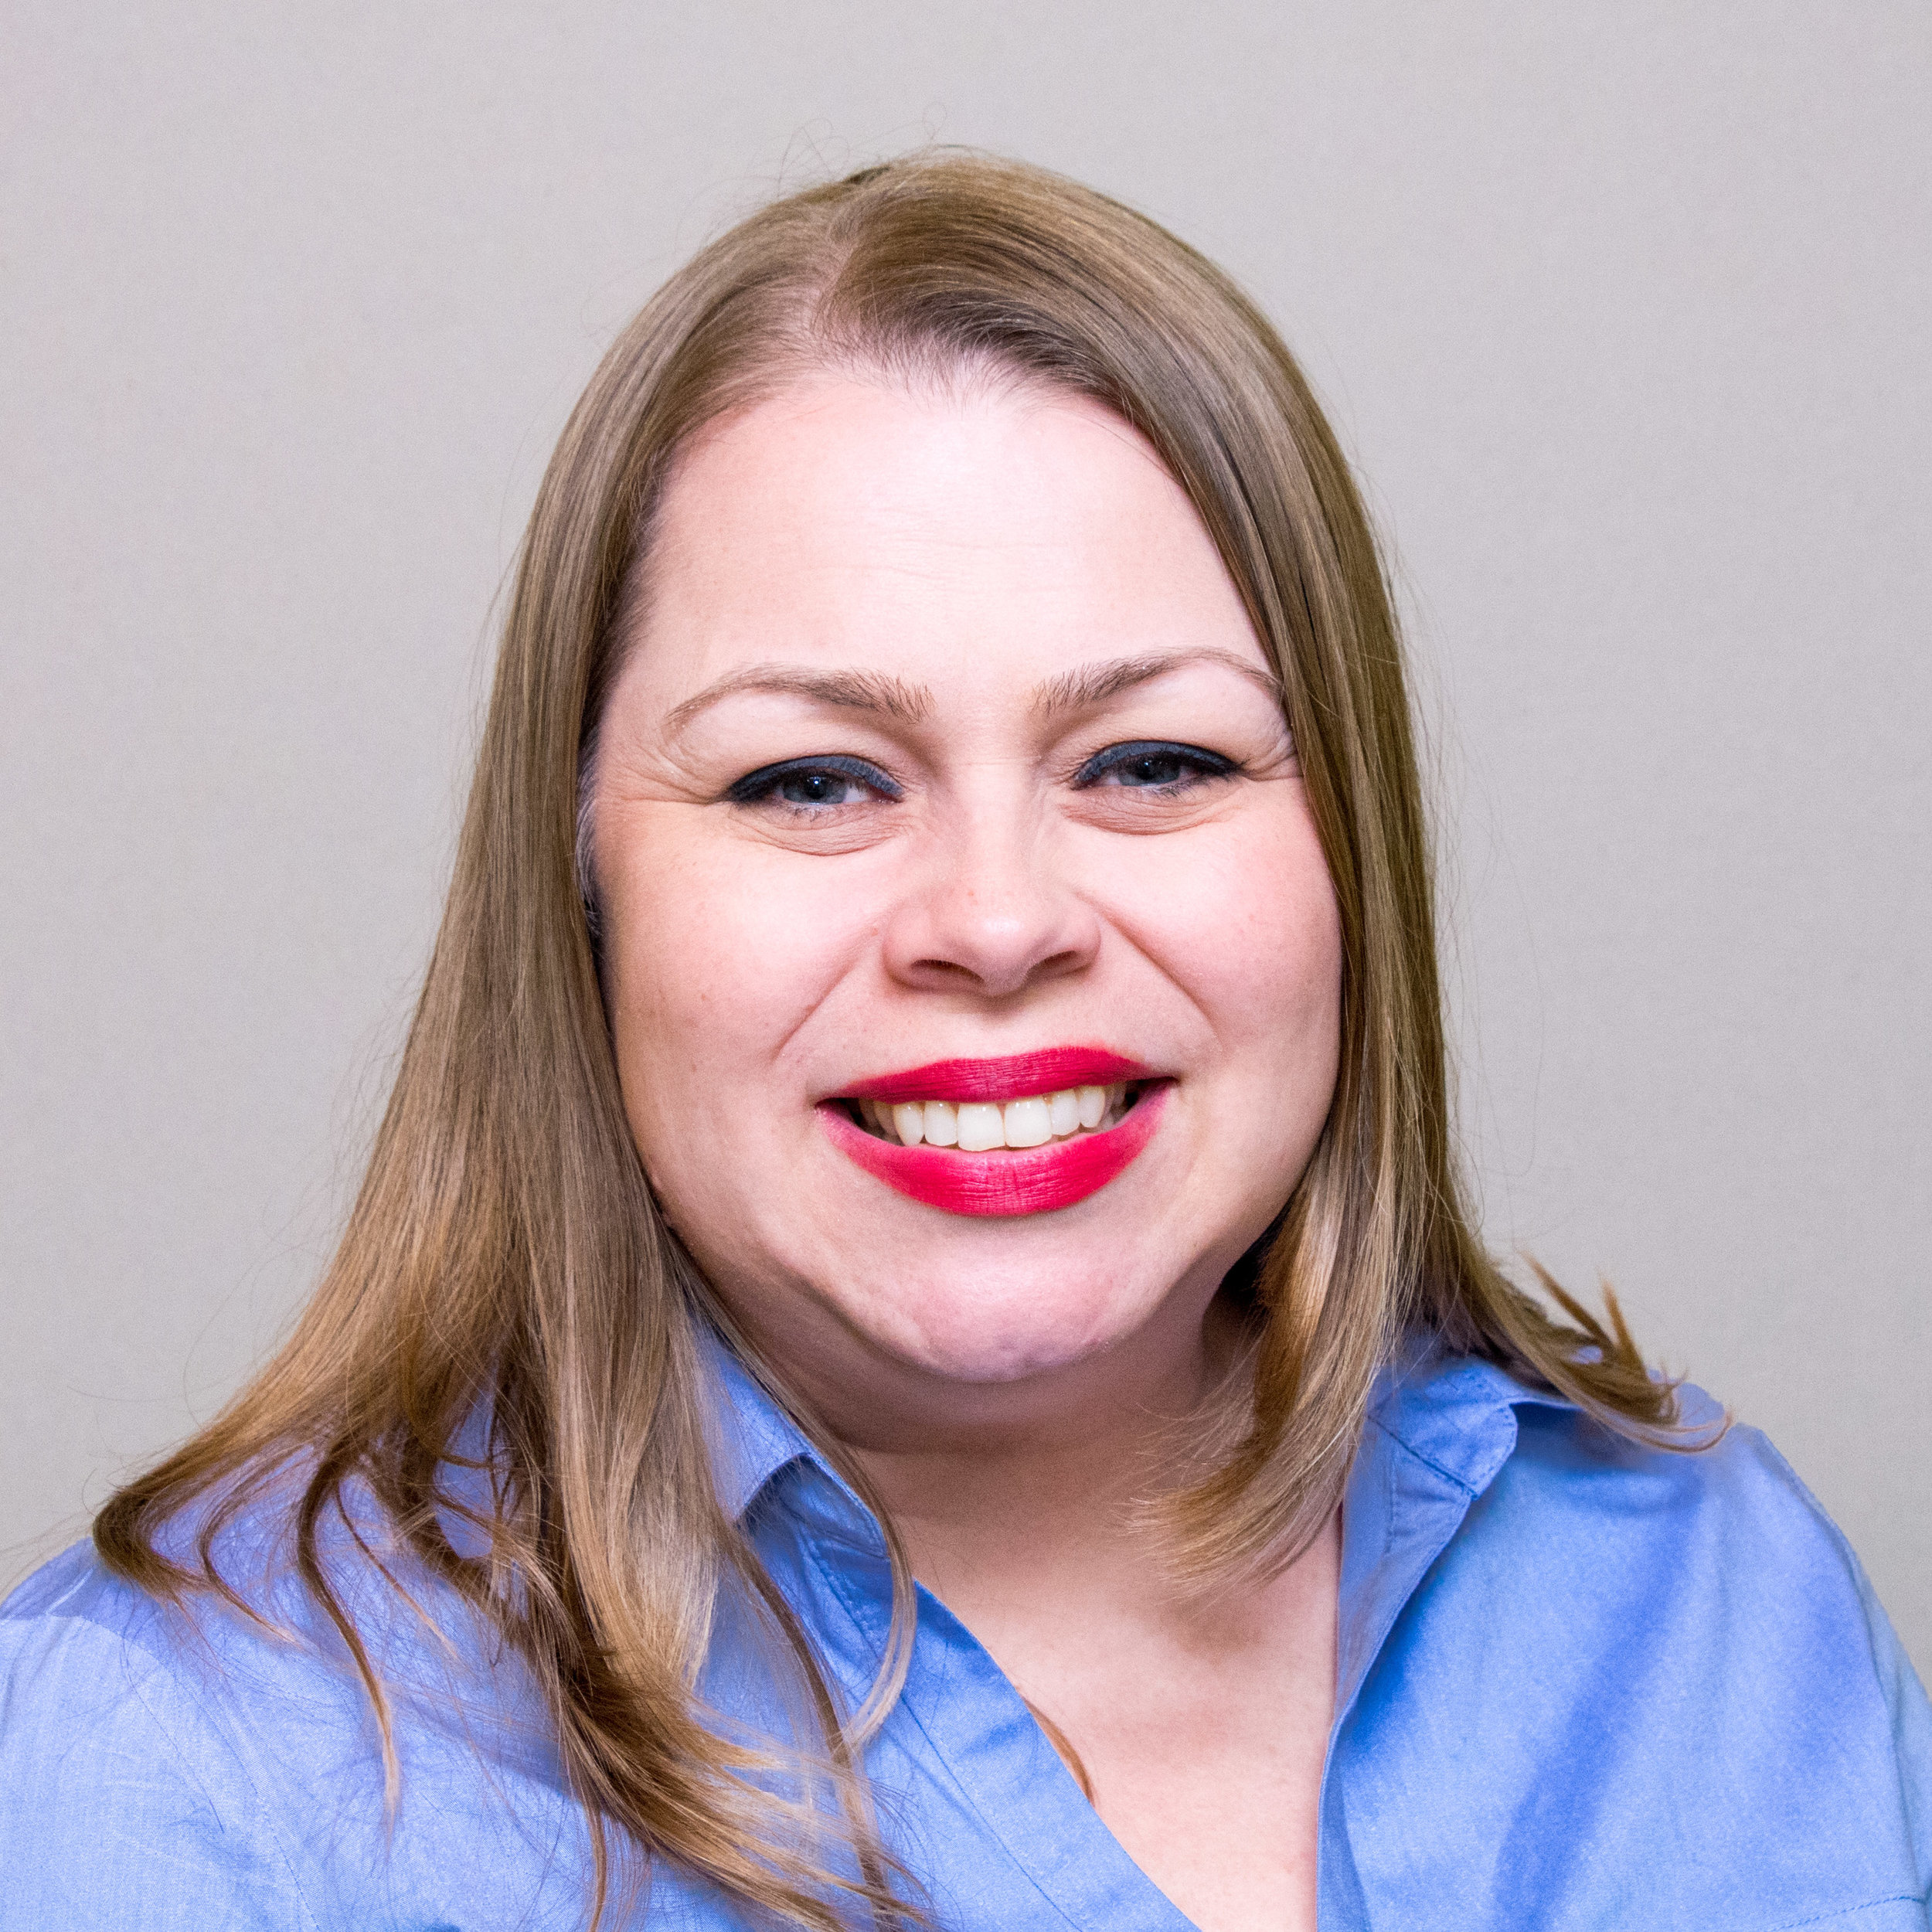 Judith Cruz, Community Volunteer